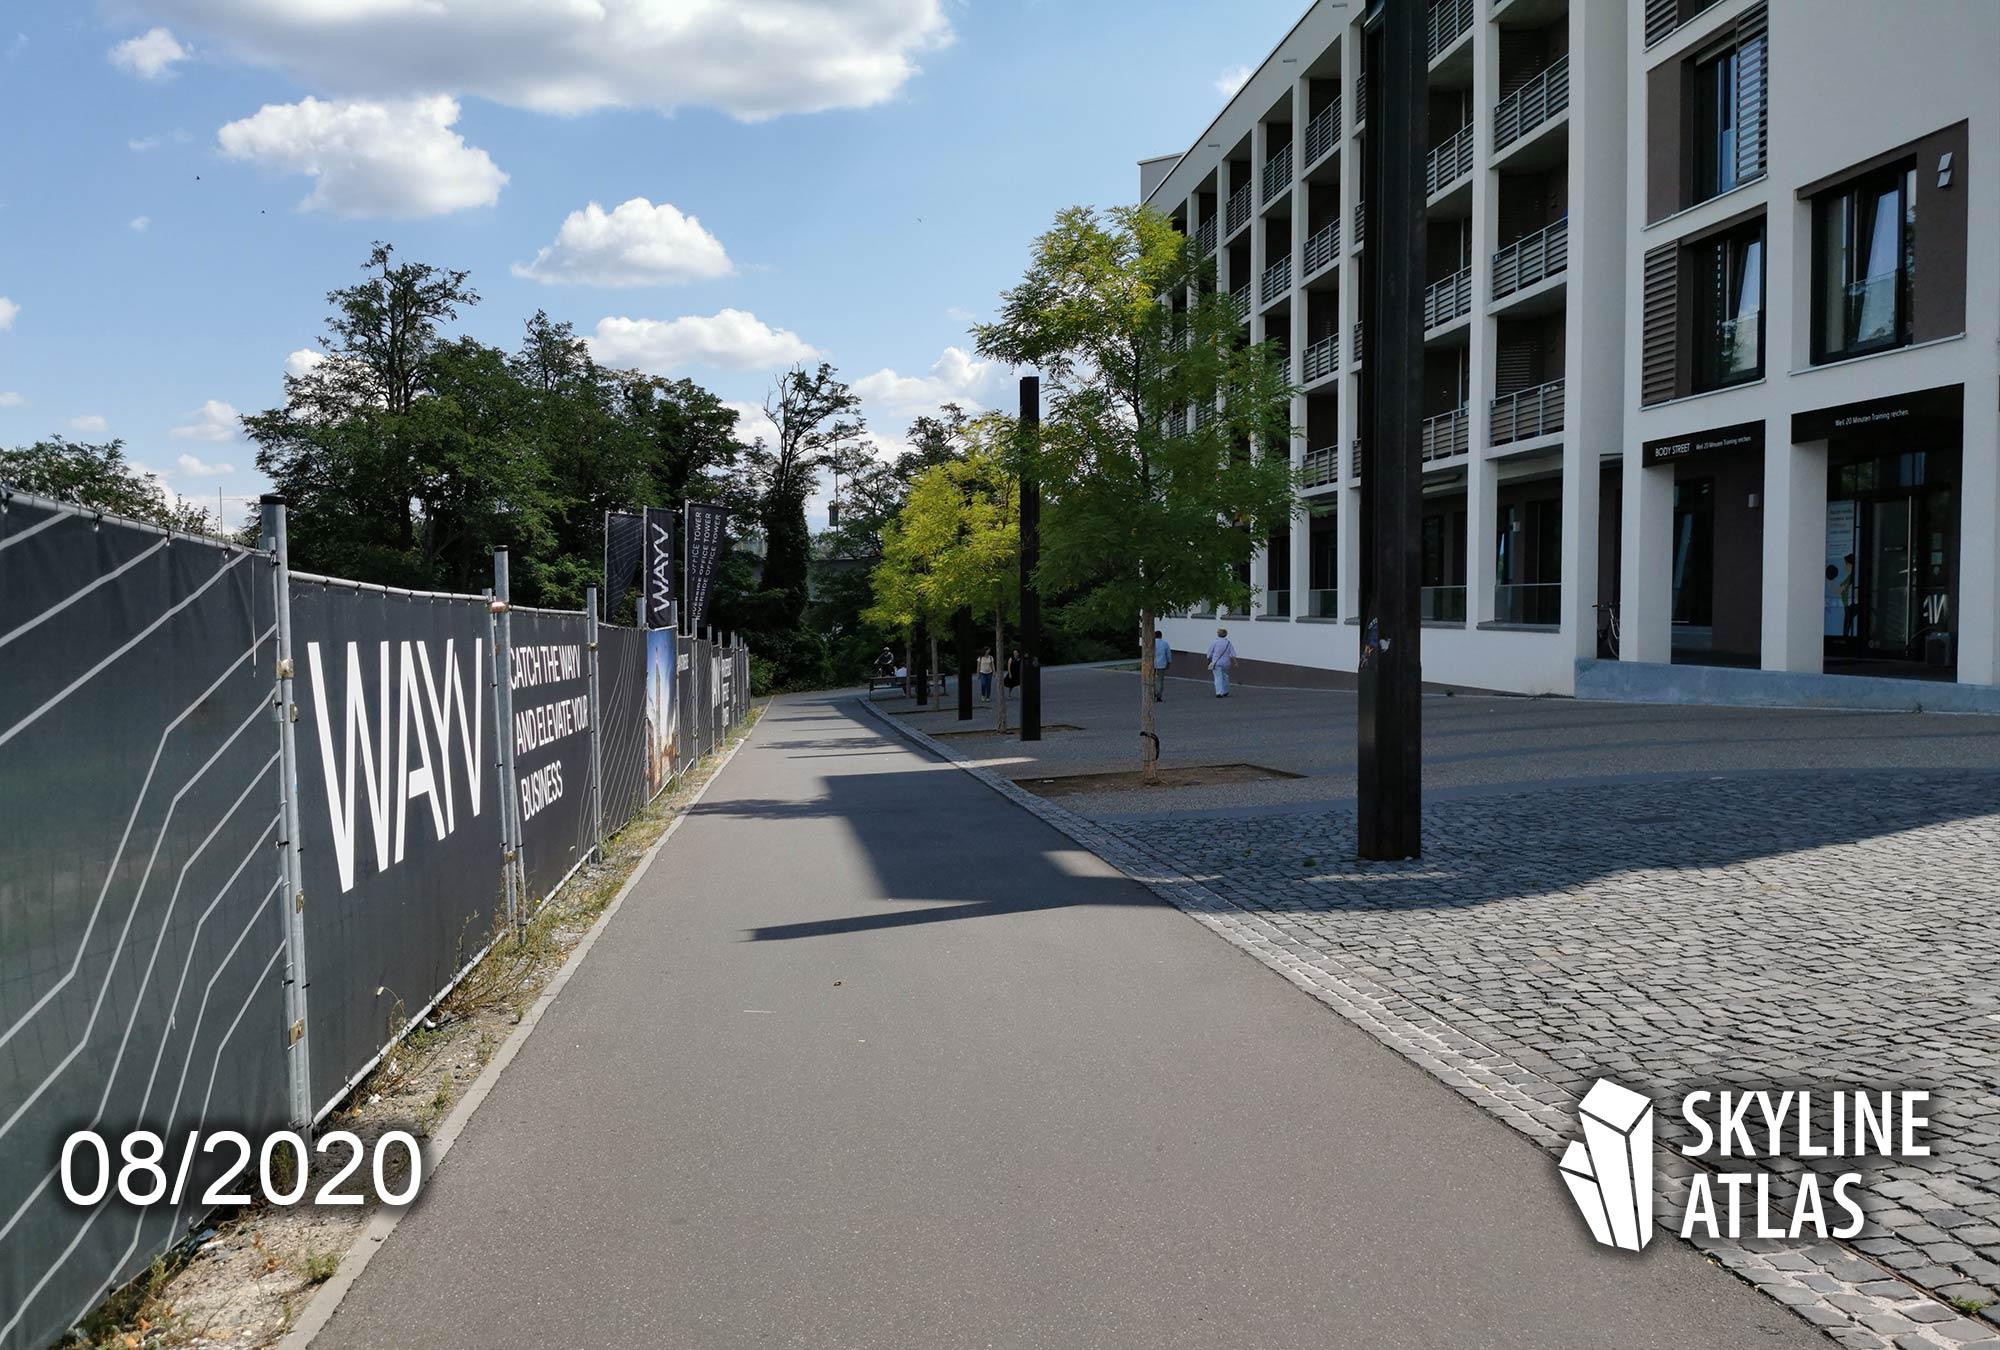 Wayv Offenbach - Riverside Office Tower - Büroflächen Hafen Offenbach - Moderne Büros zur Miete im Offenbacher Hafen - Blackolive Immobilienmakler - Black Olive Makler